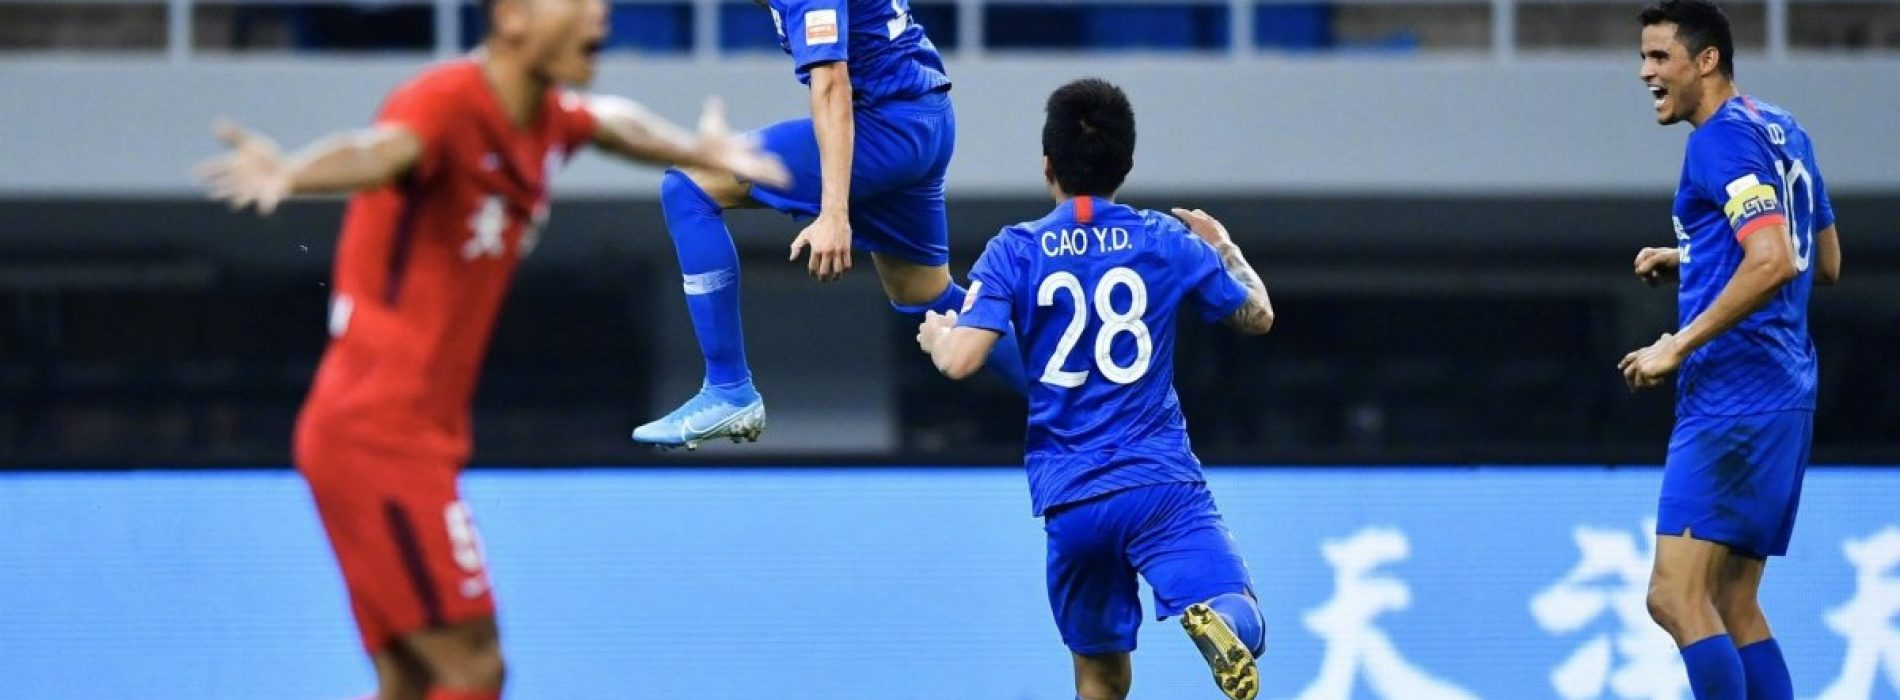 El Shaarawy, debutto da titolare in Cina con gol e assist